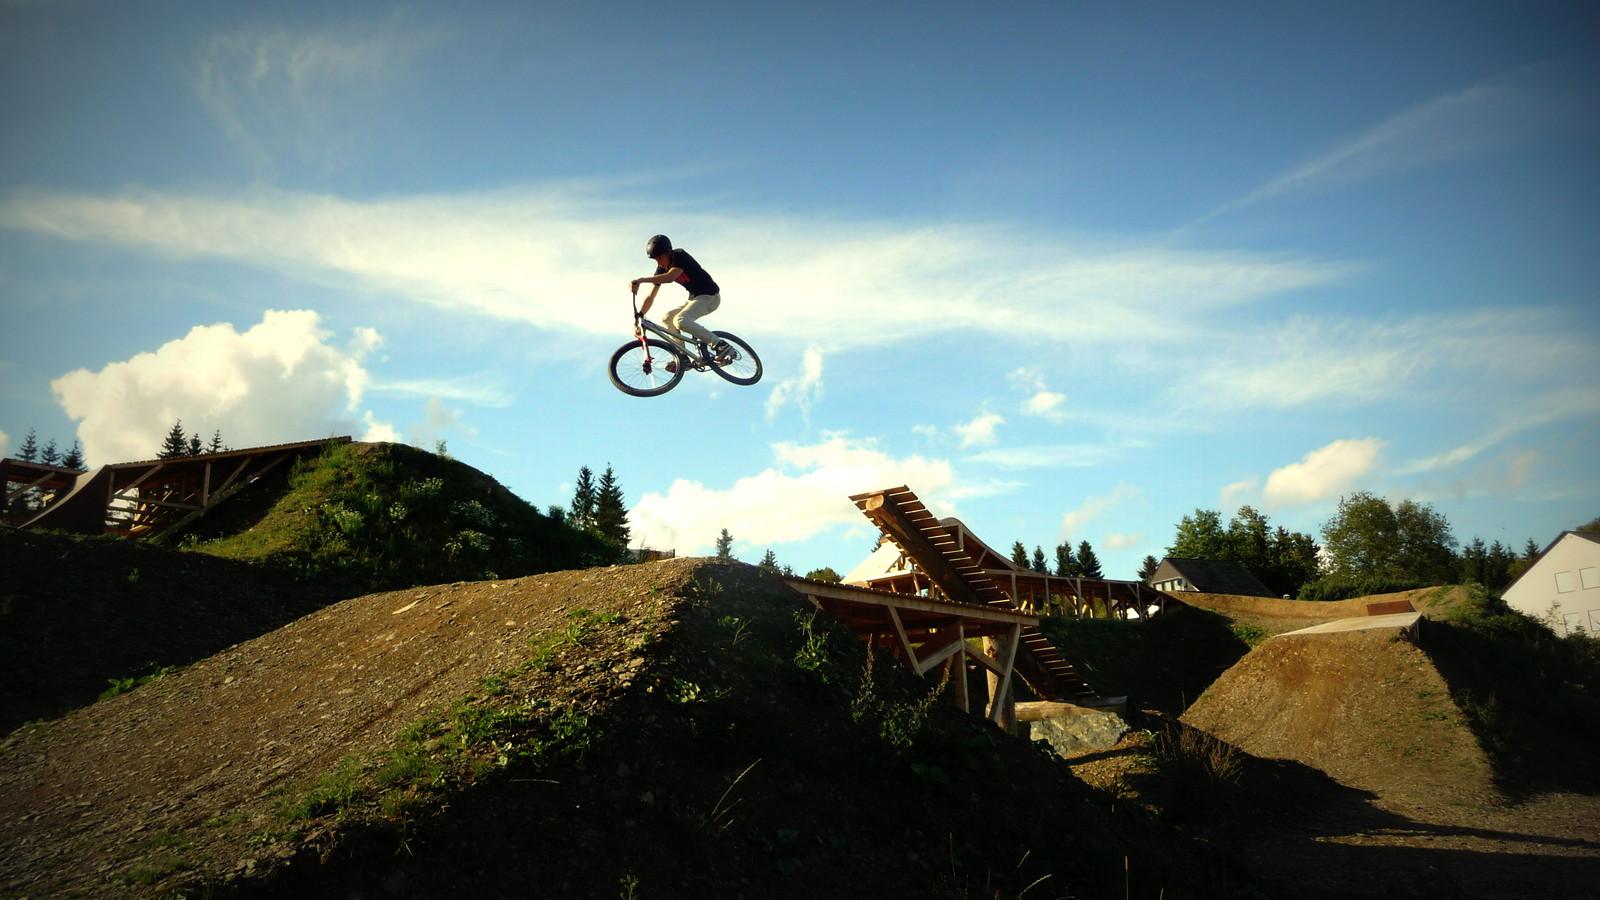 Red Bull Bergline Boner Log - JonaB - Mountain Biking Pictures - Vital MTB